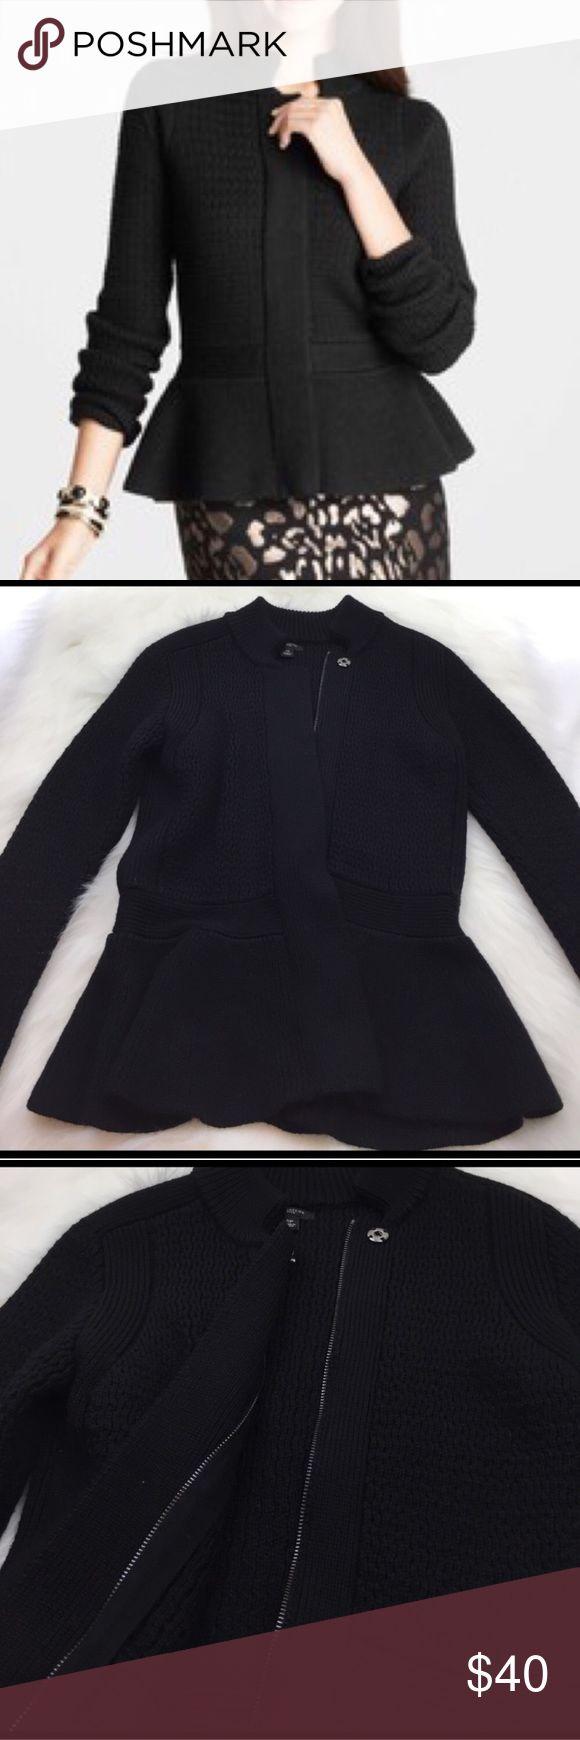 Ann Taylor Wool Peplum Sweater Jacket Very professional and chic Ann Taylor Wool Peplum Sweater Jacket. EUC. Color: Black. Size: SP Ann Taylor Sweaters Cardigans